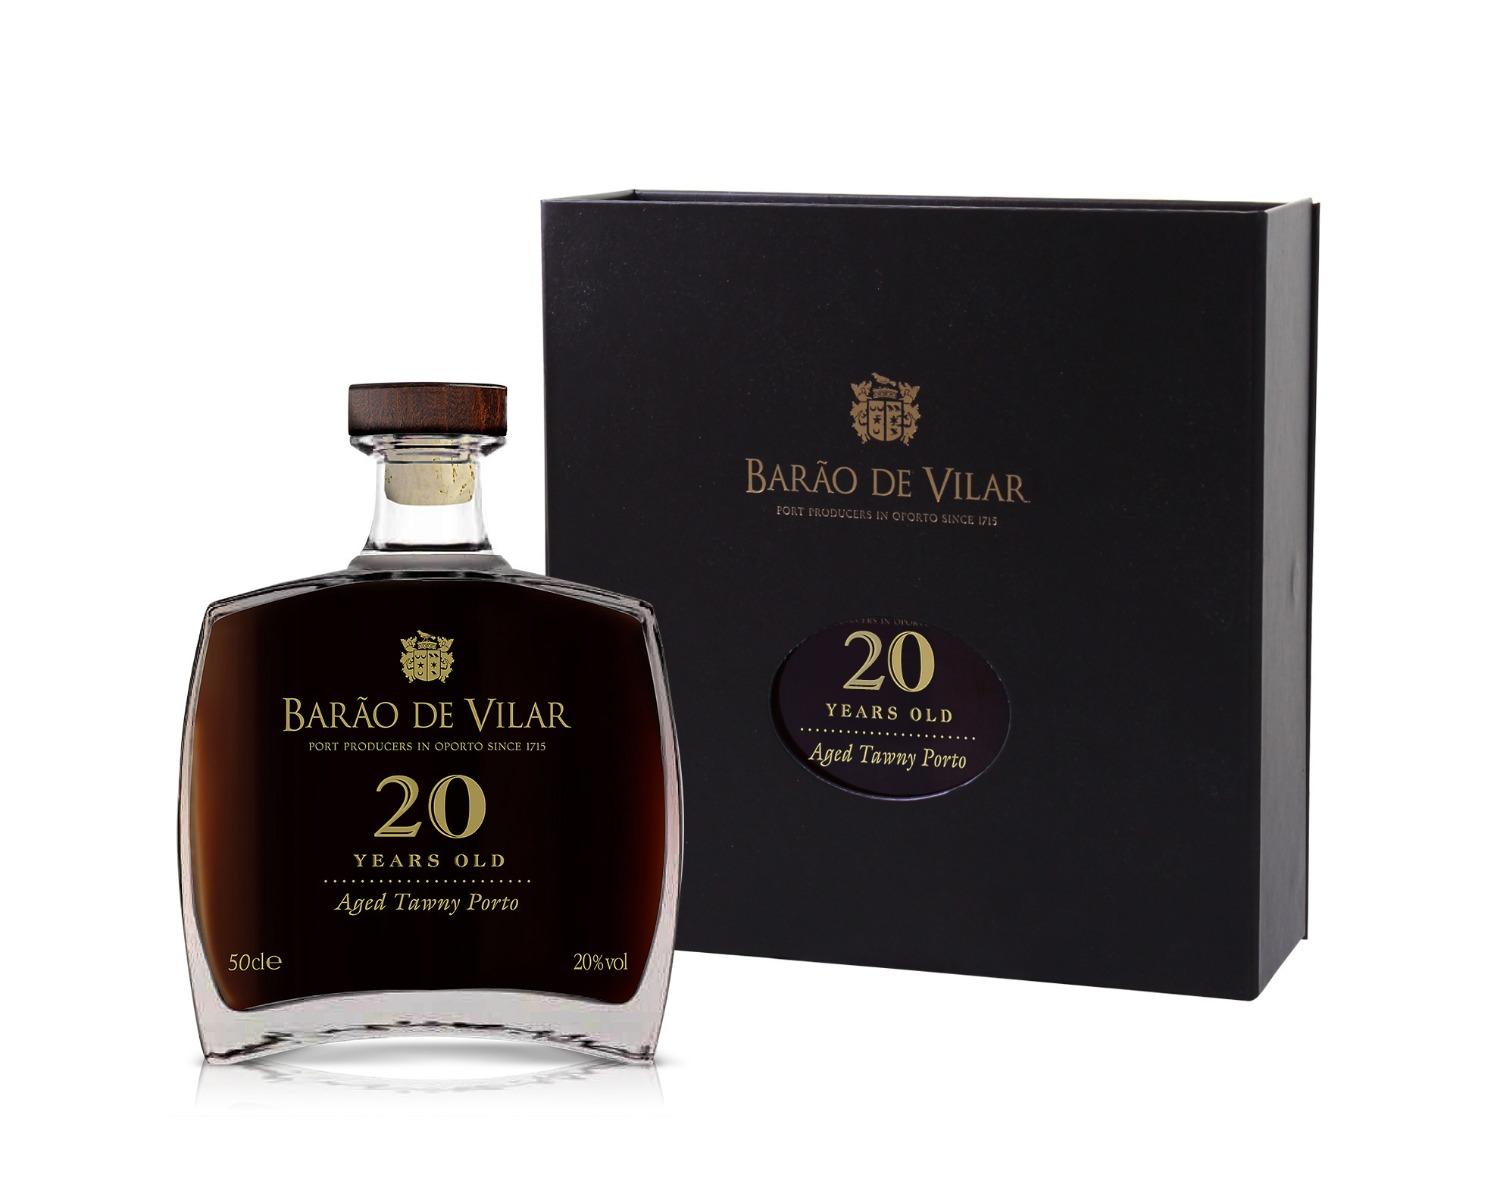 Barão de Vilar 20 years old Tawny Port (1 fles)